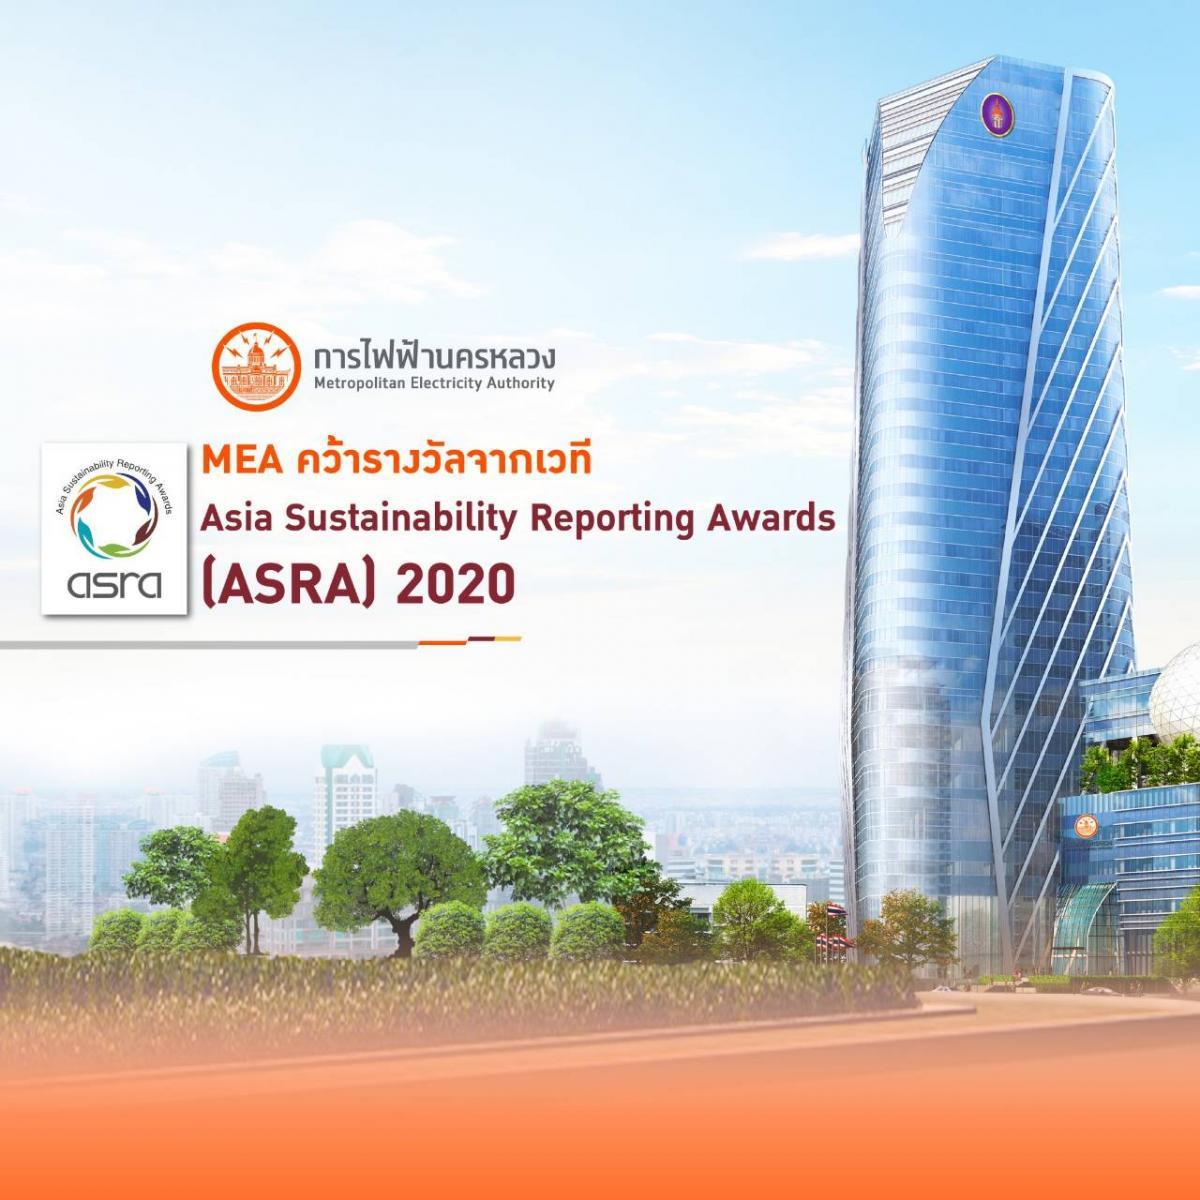 MEA คว้ารางวัลจากเวที Asia Sustainability Reporting Awards (ASRA) 2020